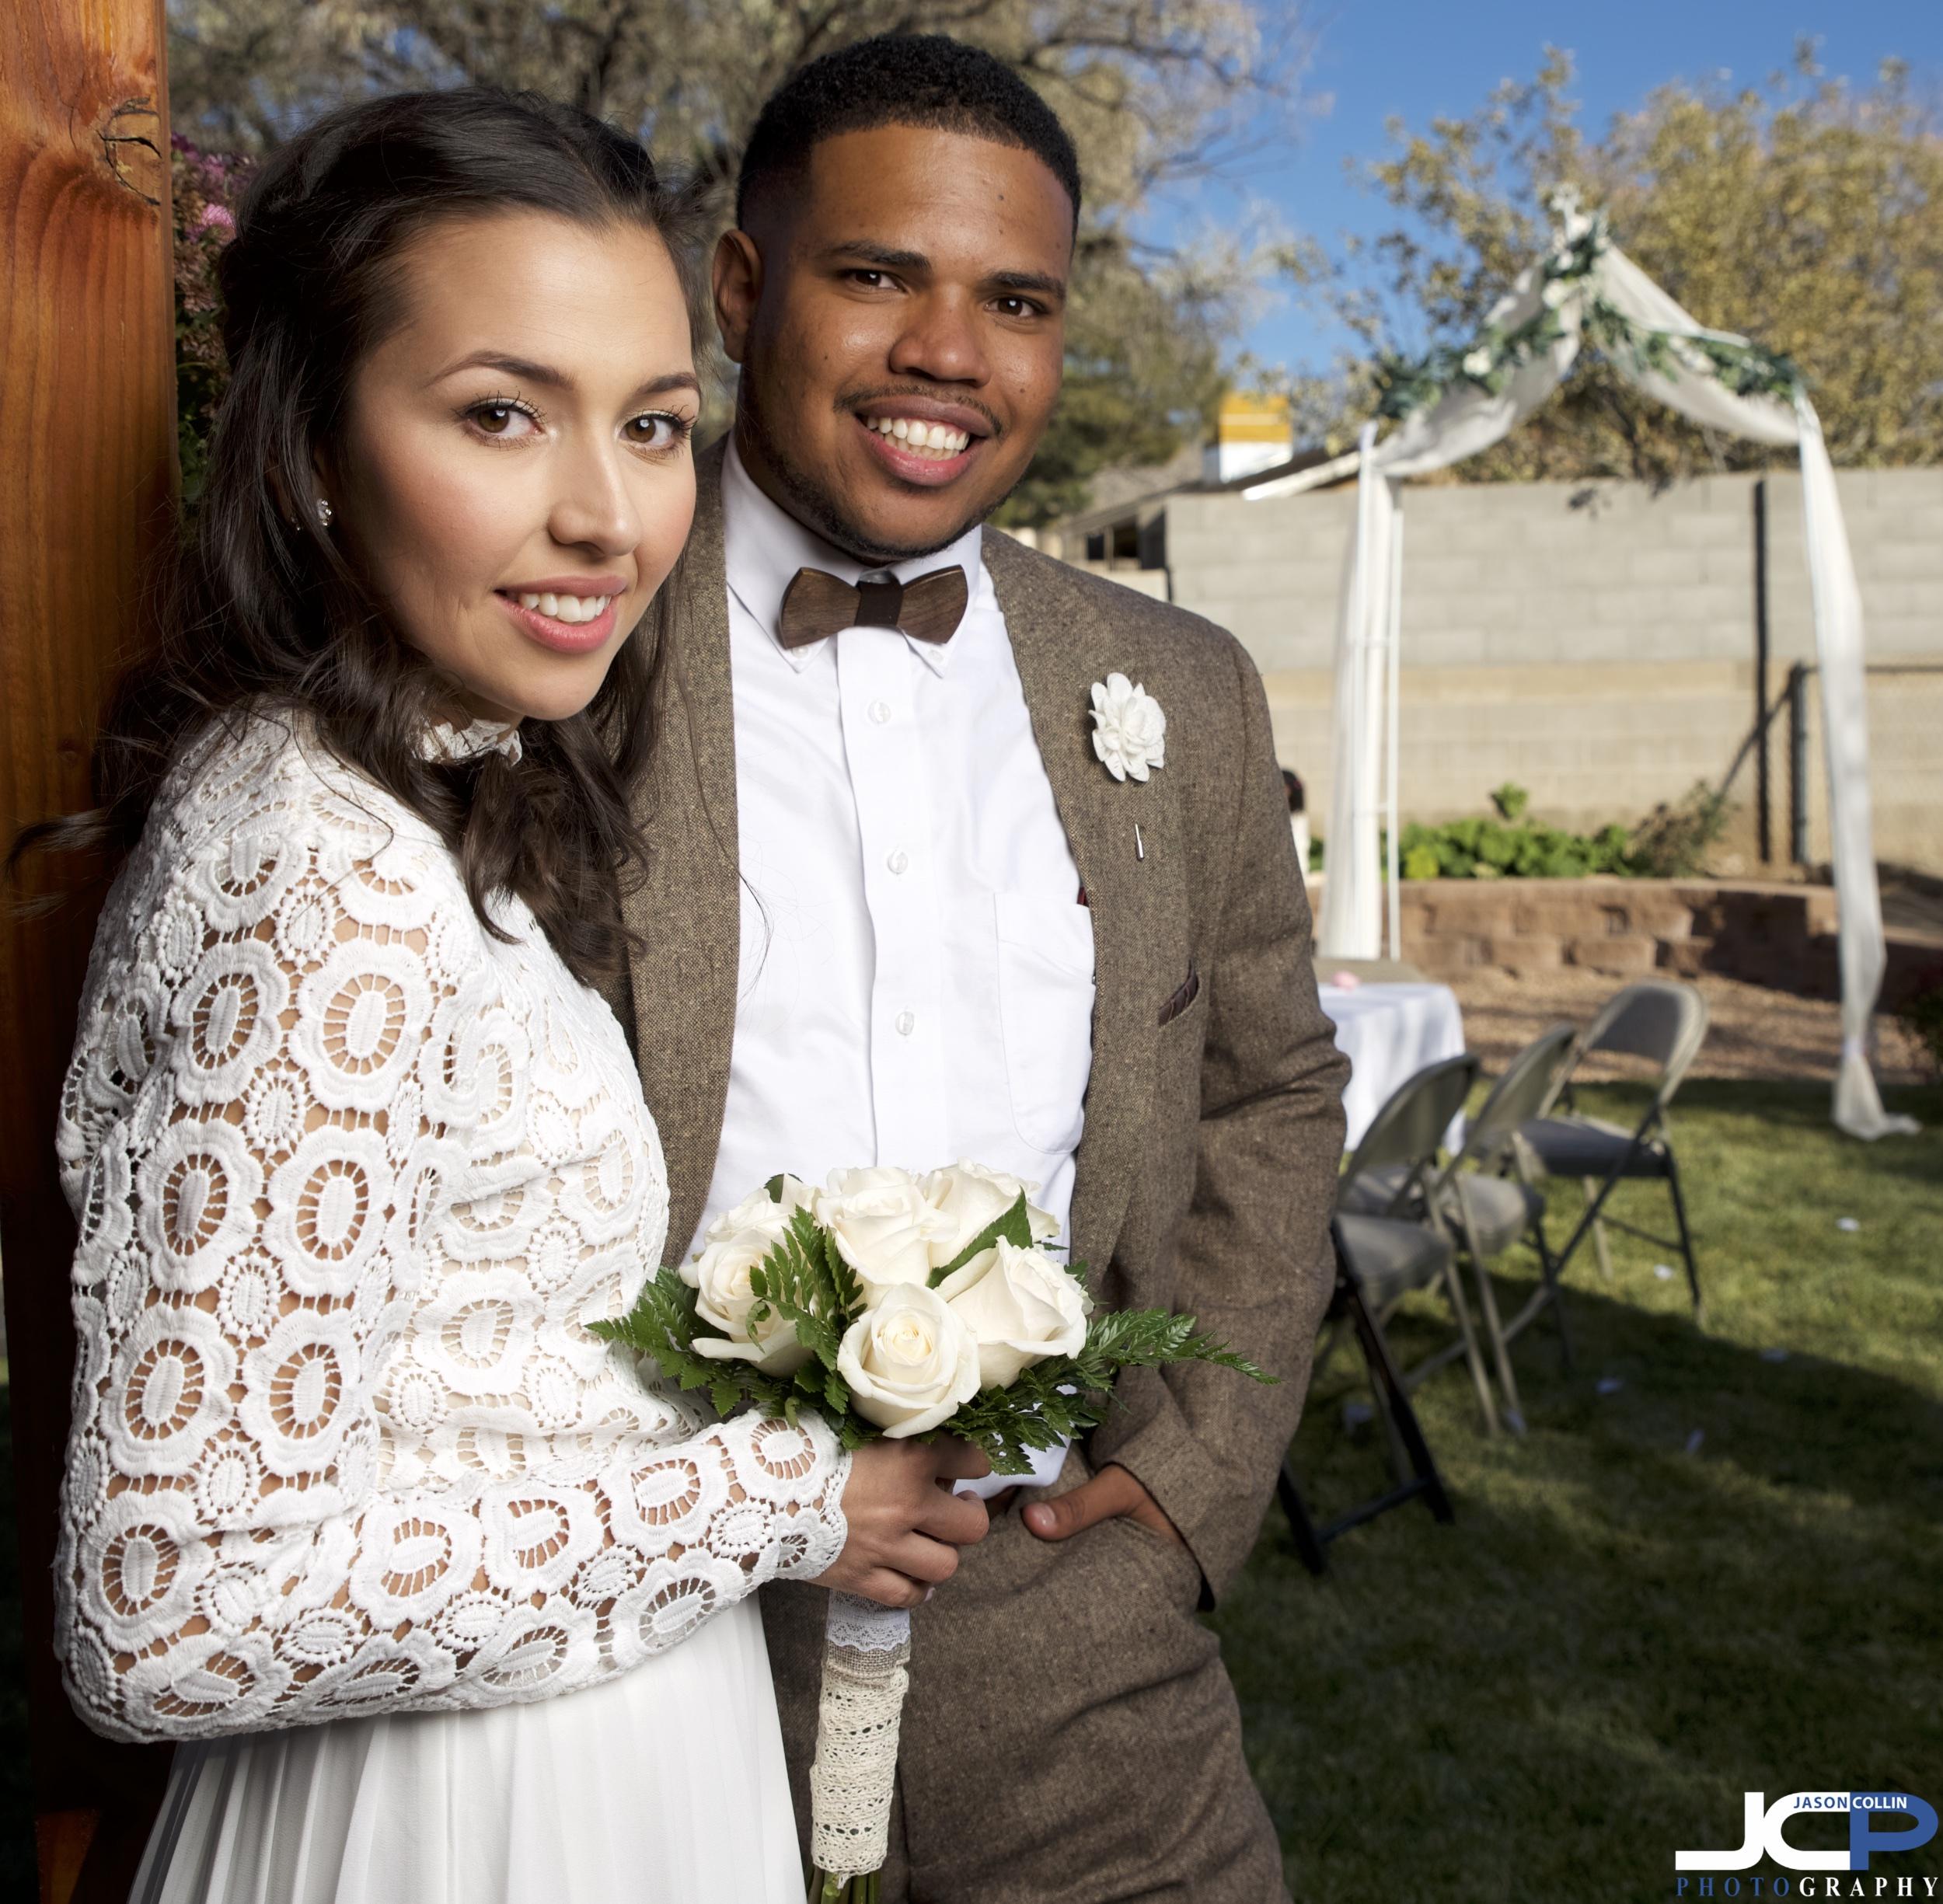 ac-11-17-2018-wedding-113463.jpg